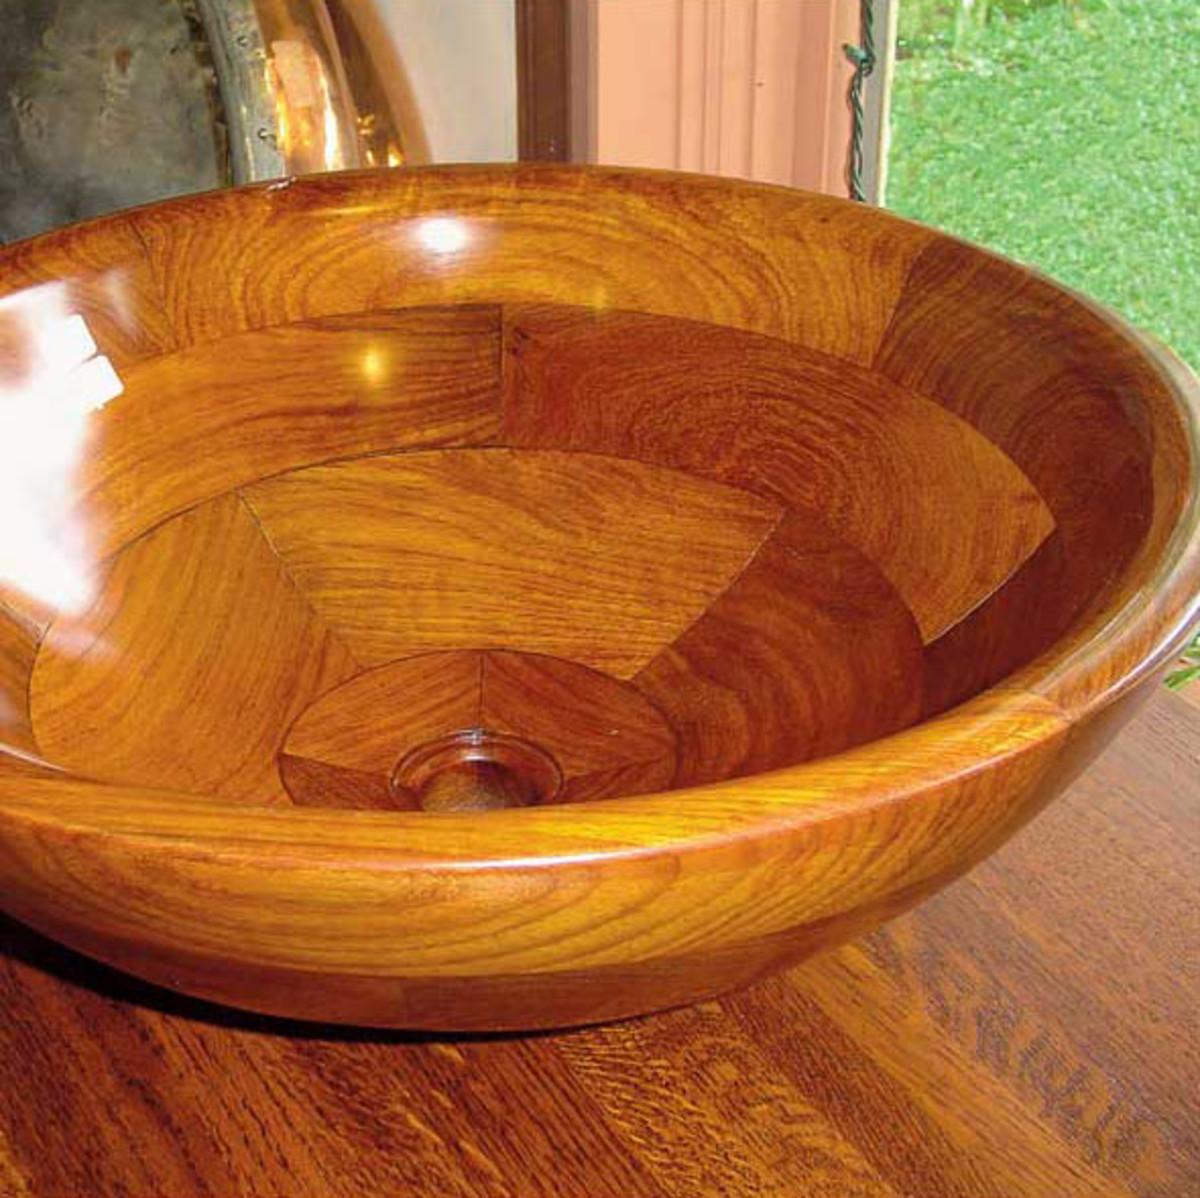 Wood vessel from Bathroom Machineries